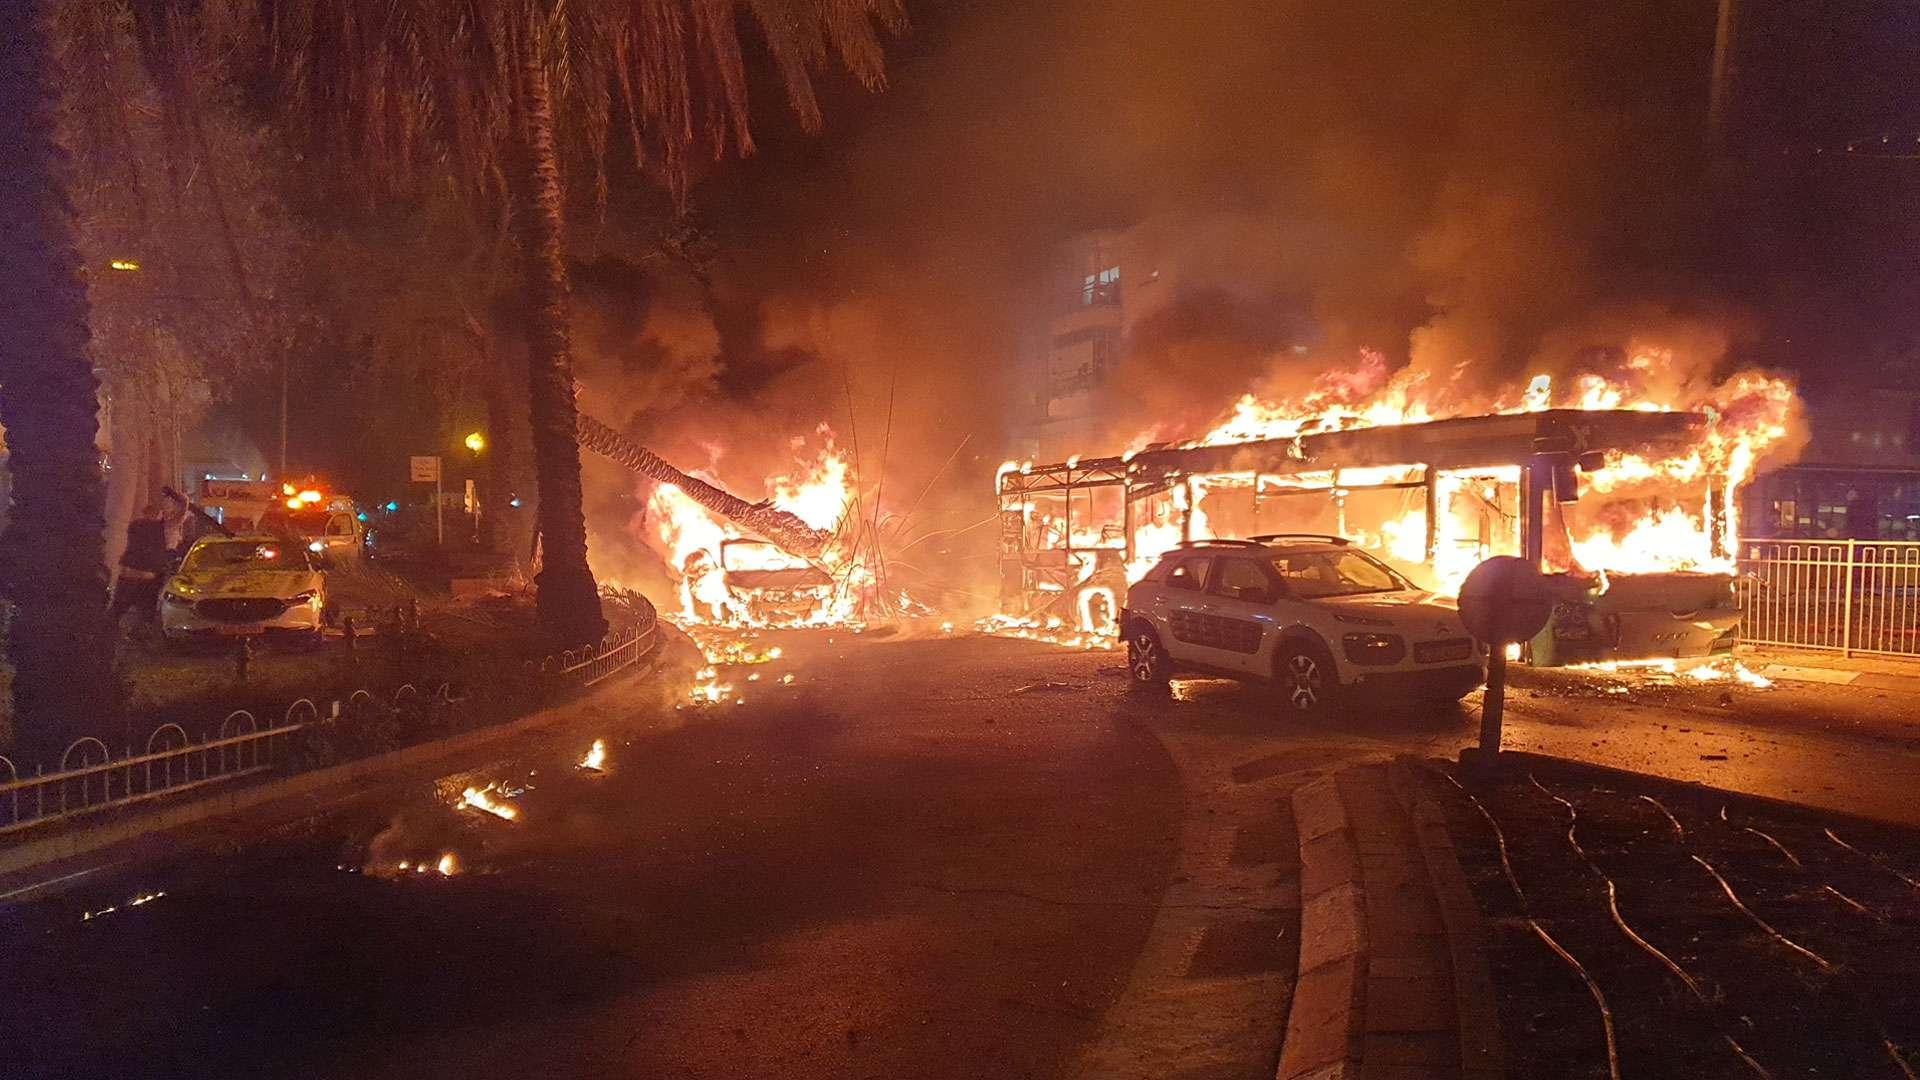 Holon Israel Aftermath of Hamas Attack